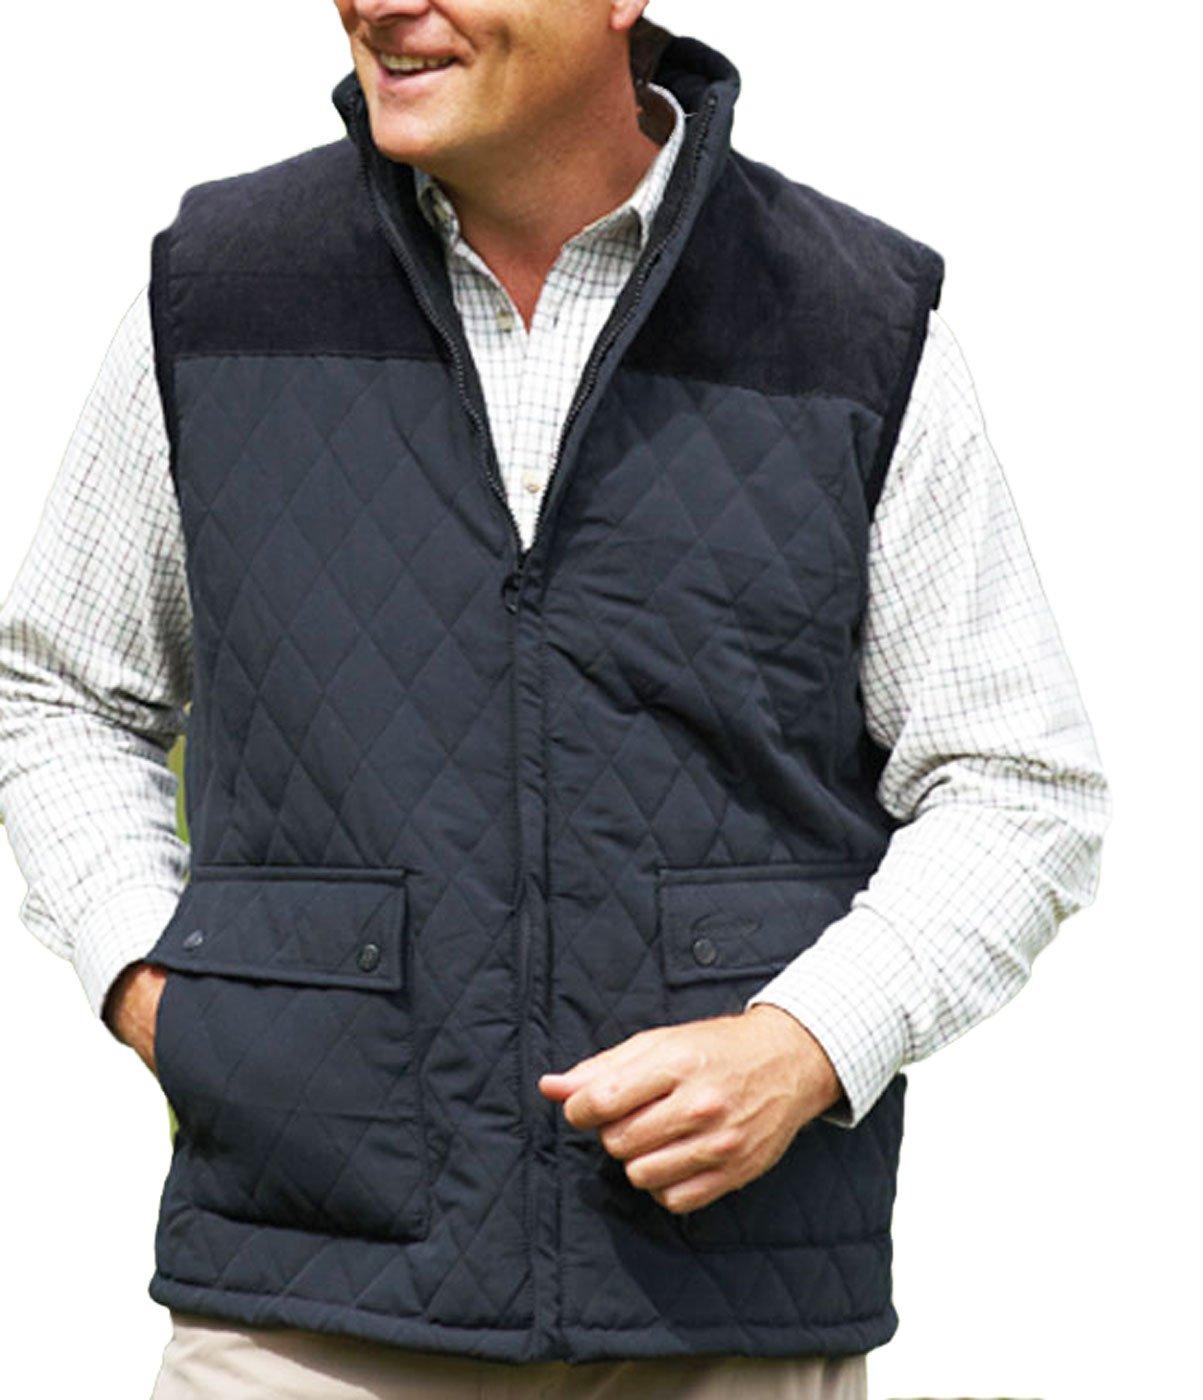 Mens Champion Country Estate Arundel Fleece Lined BodyWarmer Gilet Outerwear SUW